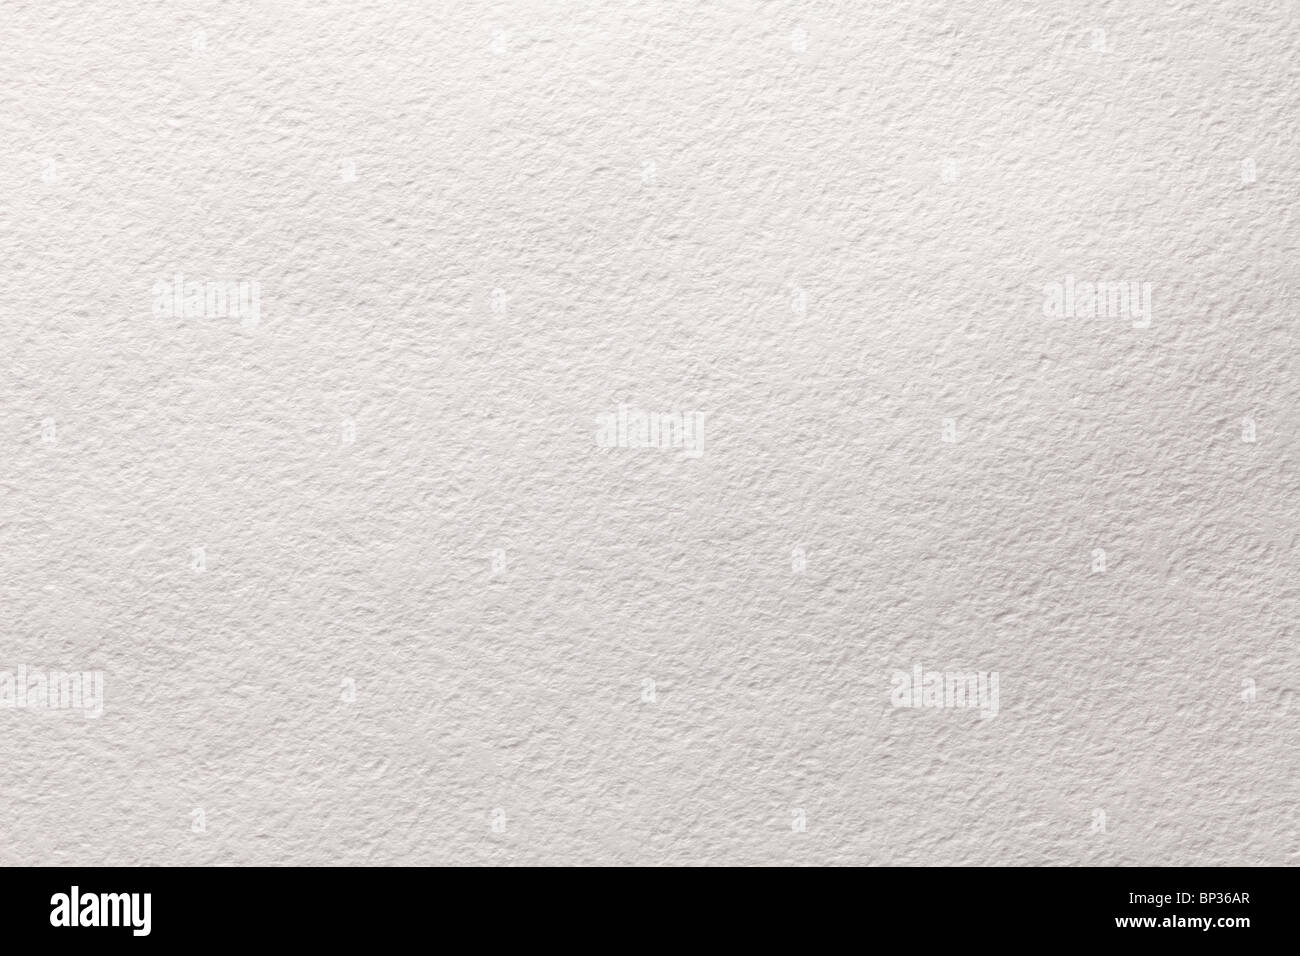 Texture watercolor paper. - Stock Image